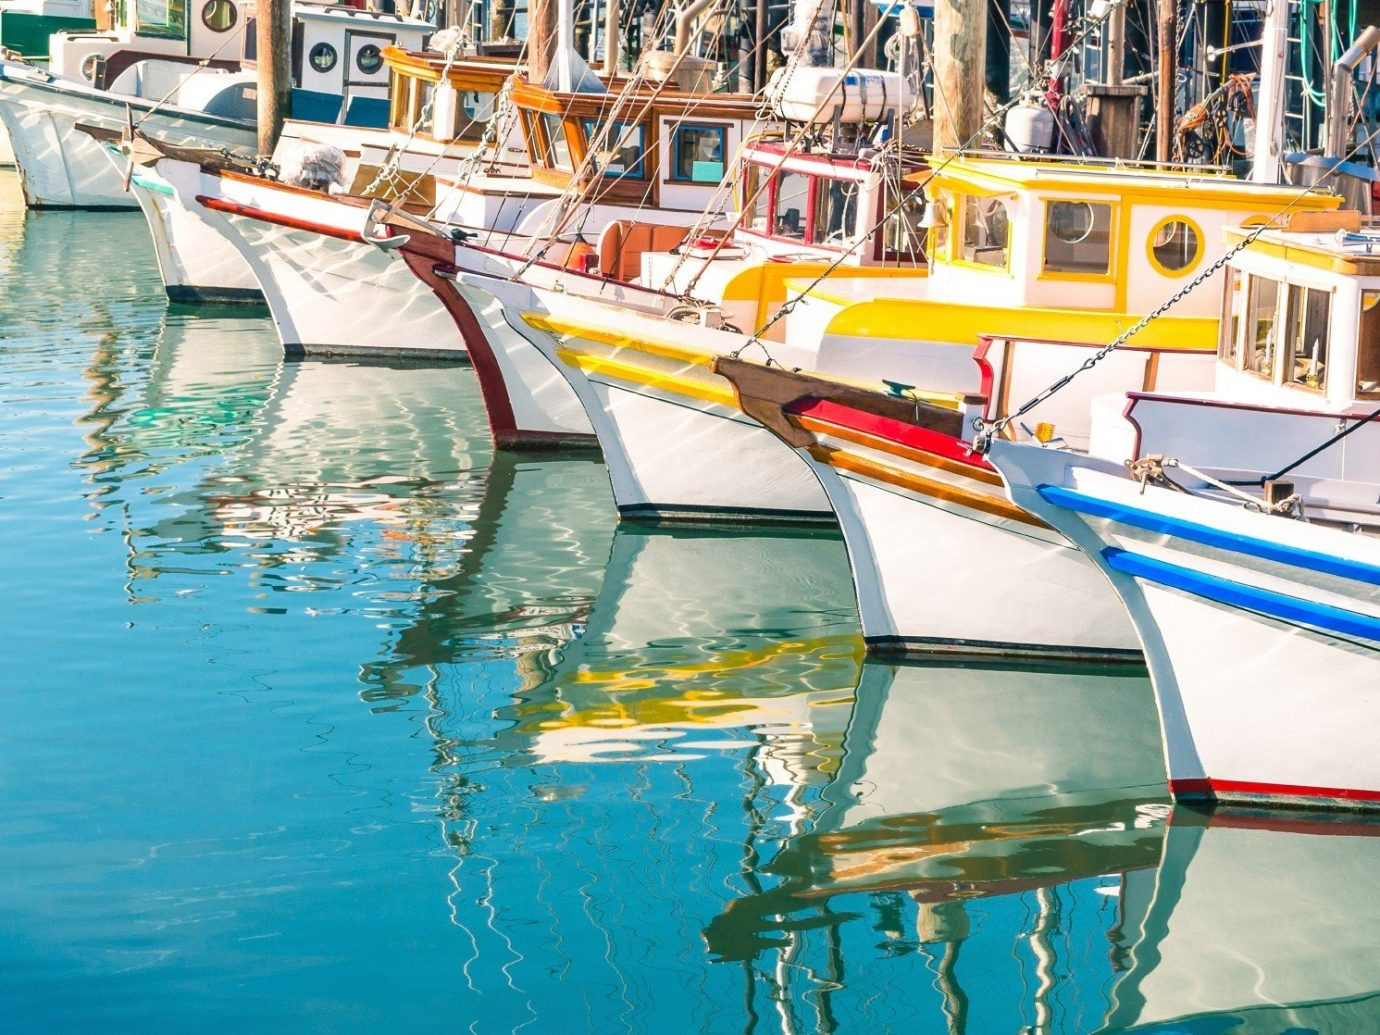 Trip Ideas water Boat outdoor vehicle scene Harbor boating Sea watercraft yellow dock waterway fishing vessel marina port